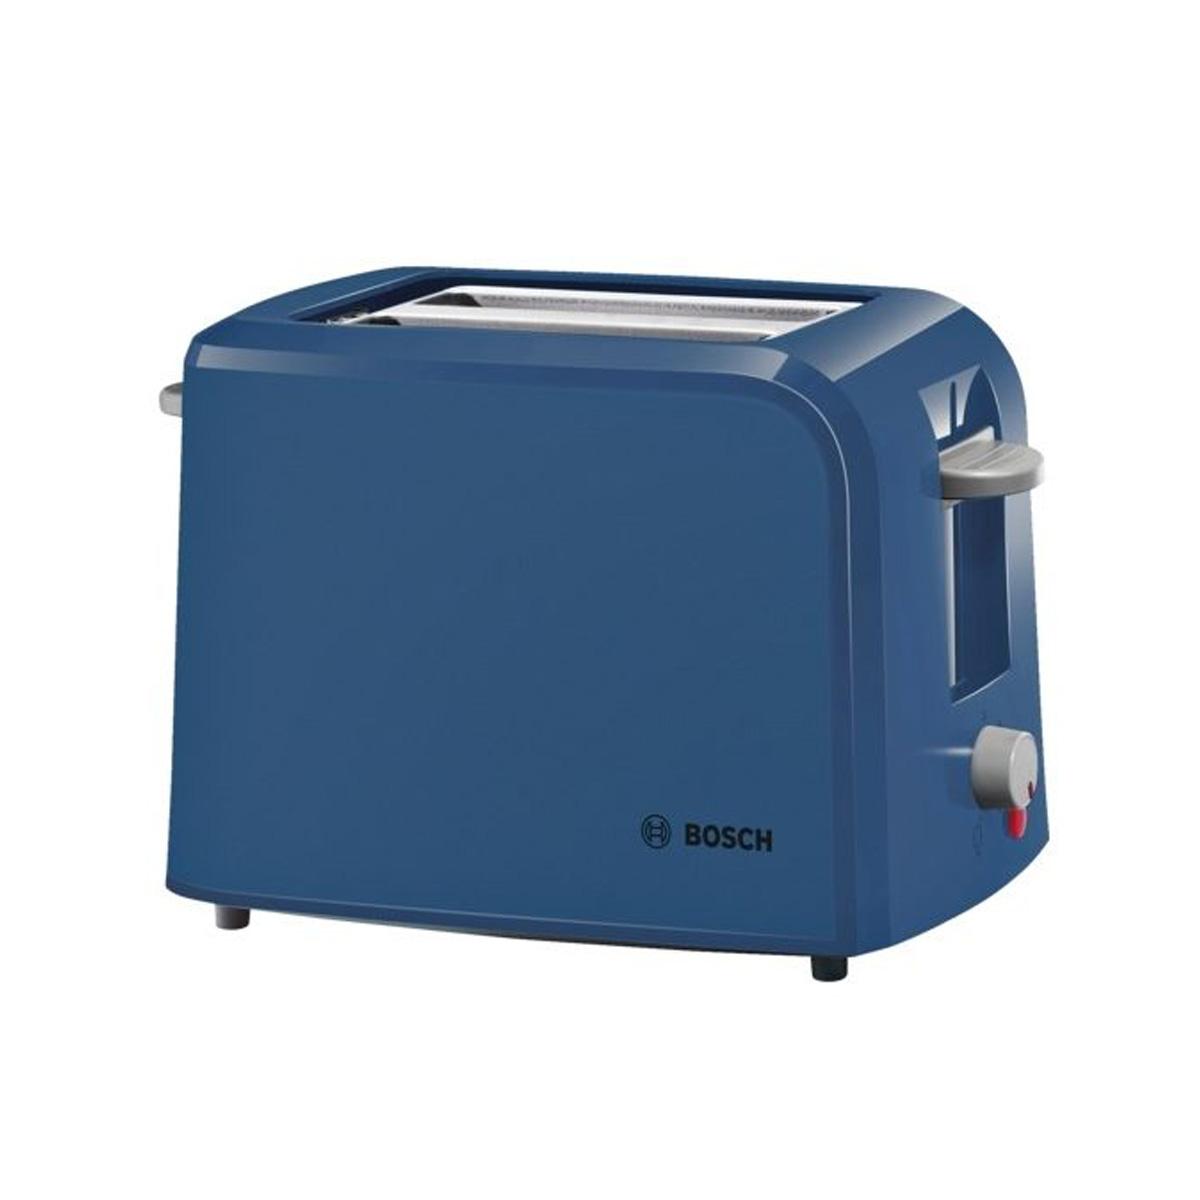 Bosch Village Collection Kettle Amp Toaster Bundle Pack